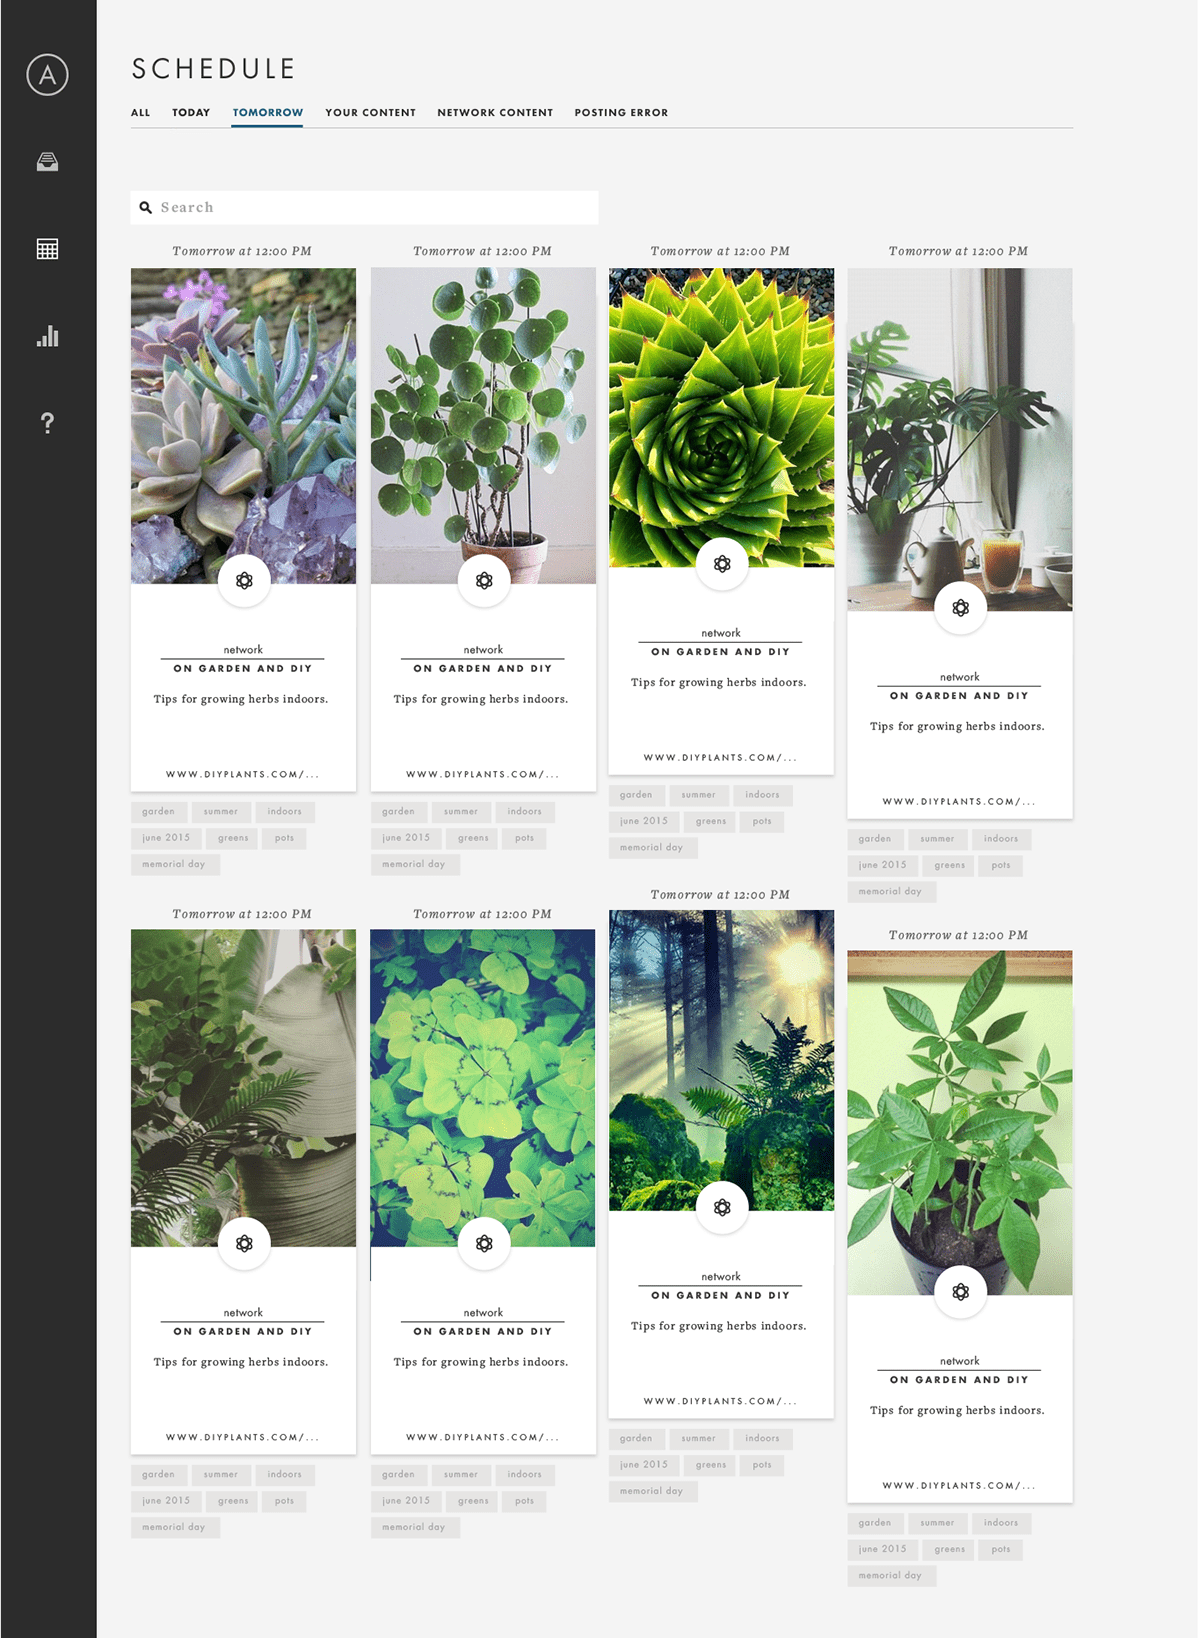 analytics aperture data visualizations graphic design  marketing software Pinterest product design  UI ux